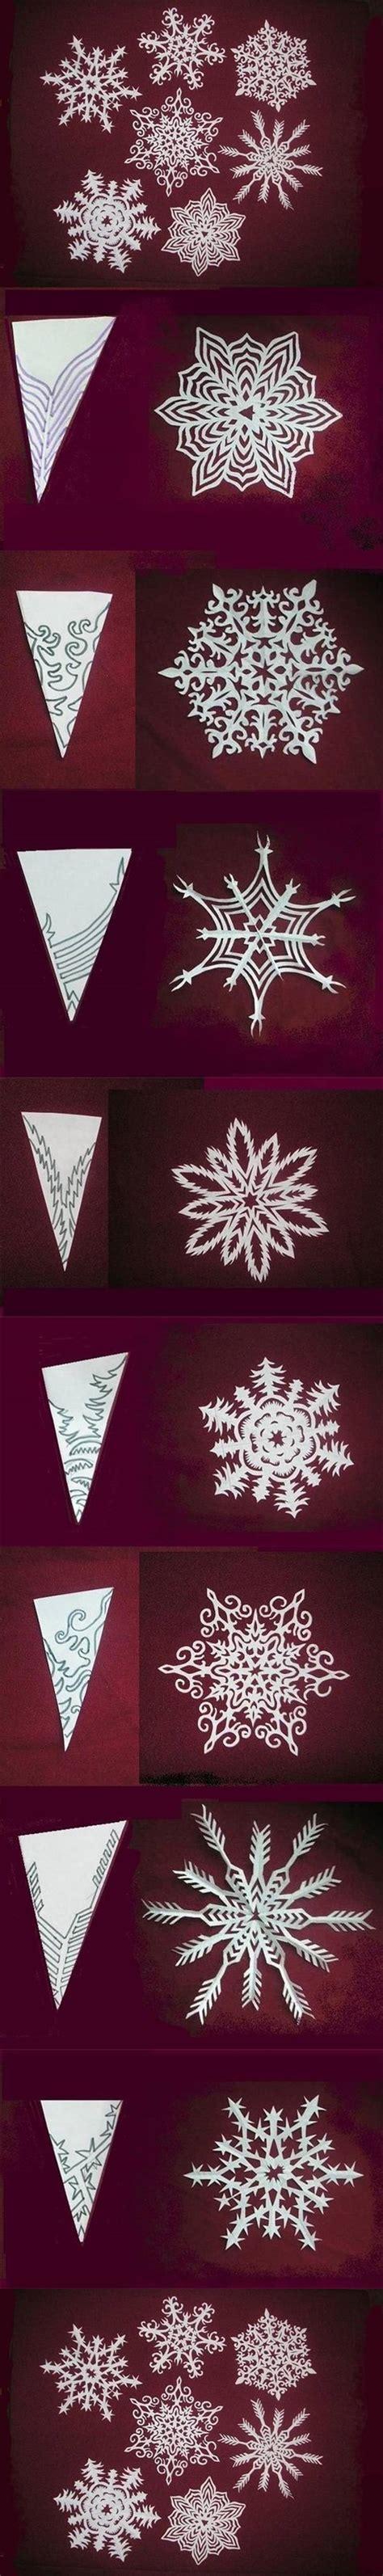 snowflakes paper craft wonderful diy paper snowflakes with pattern